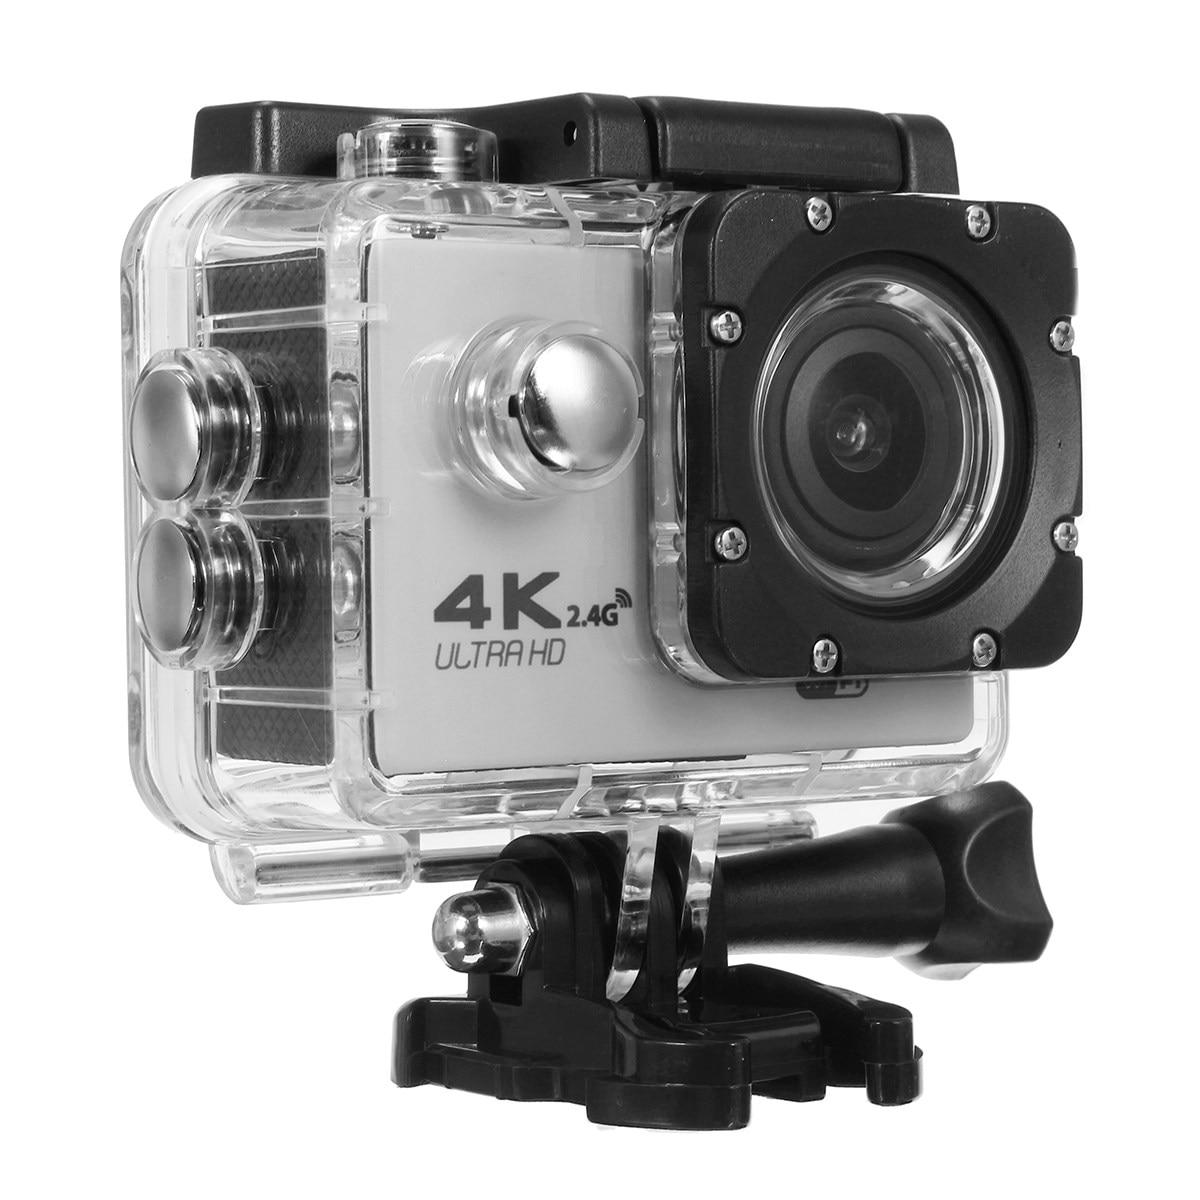 Multi Color waterproof Action Camera F60R Ultra HD 4K /30fps WiFi 2.0 170D go Helmet Cam pro underwater Sport Consumer Camera original pro4 action camera ultra hd 4k 30fps wifi 2 0 170d lens helmet cam pro underwater go waterproof sport camera